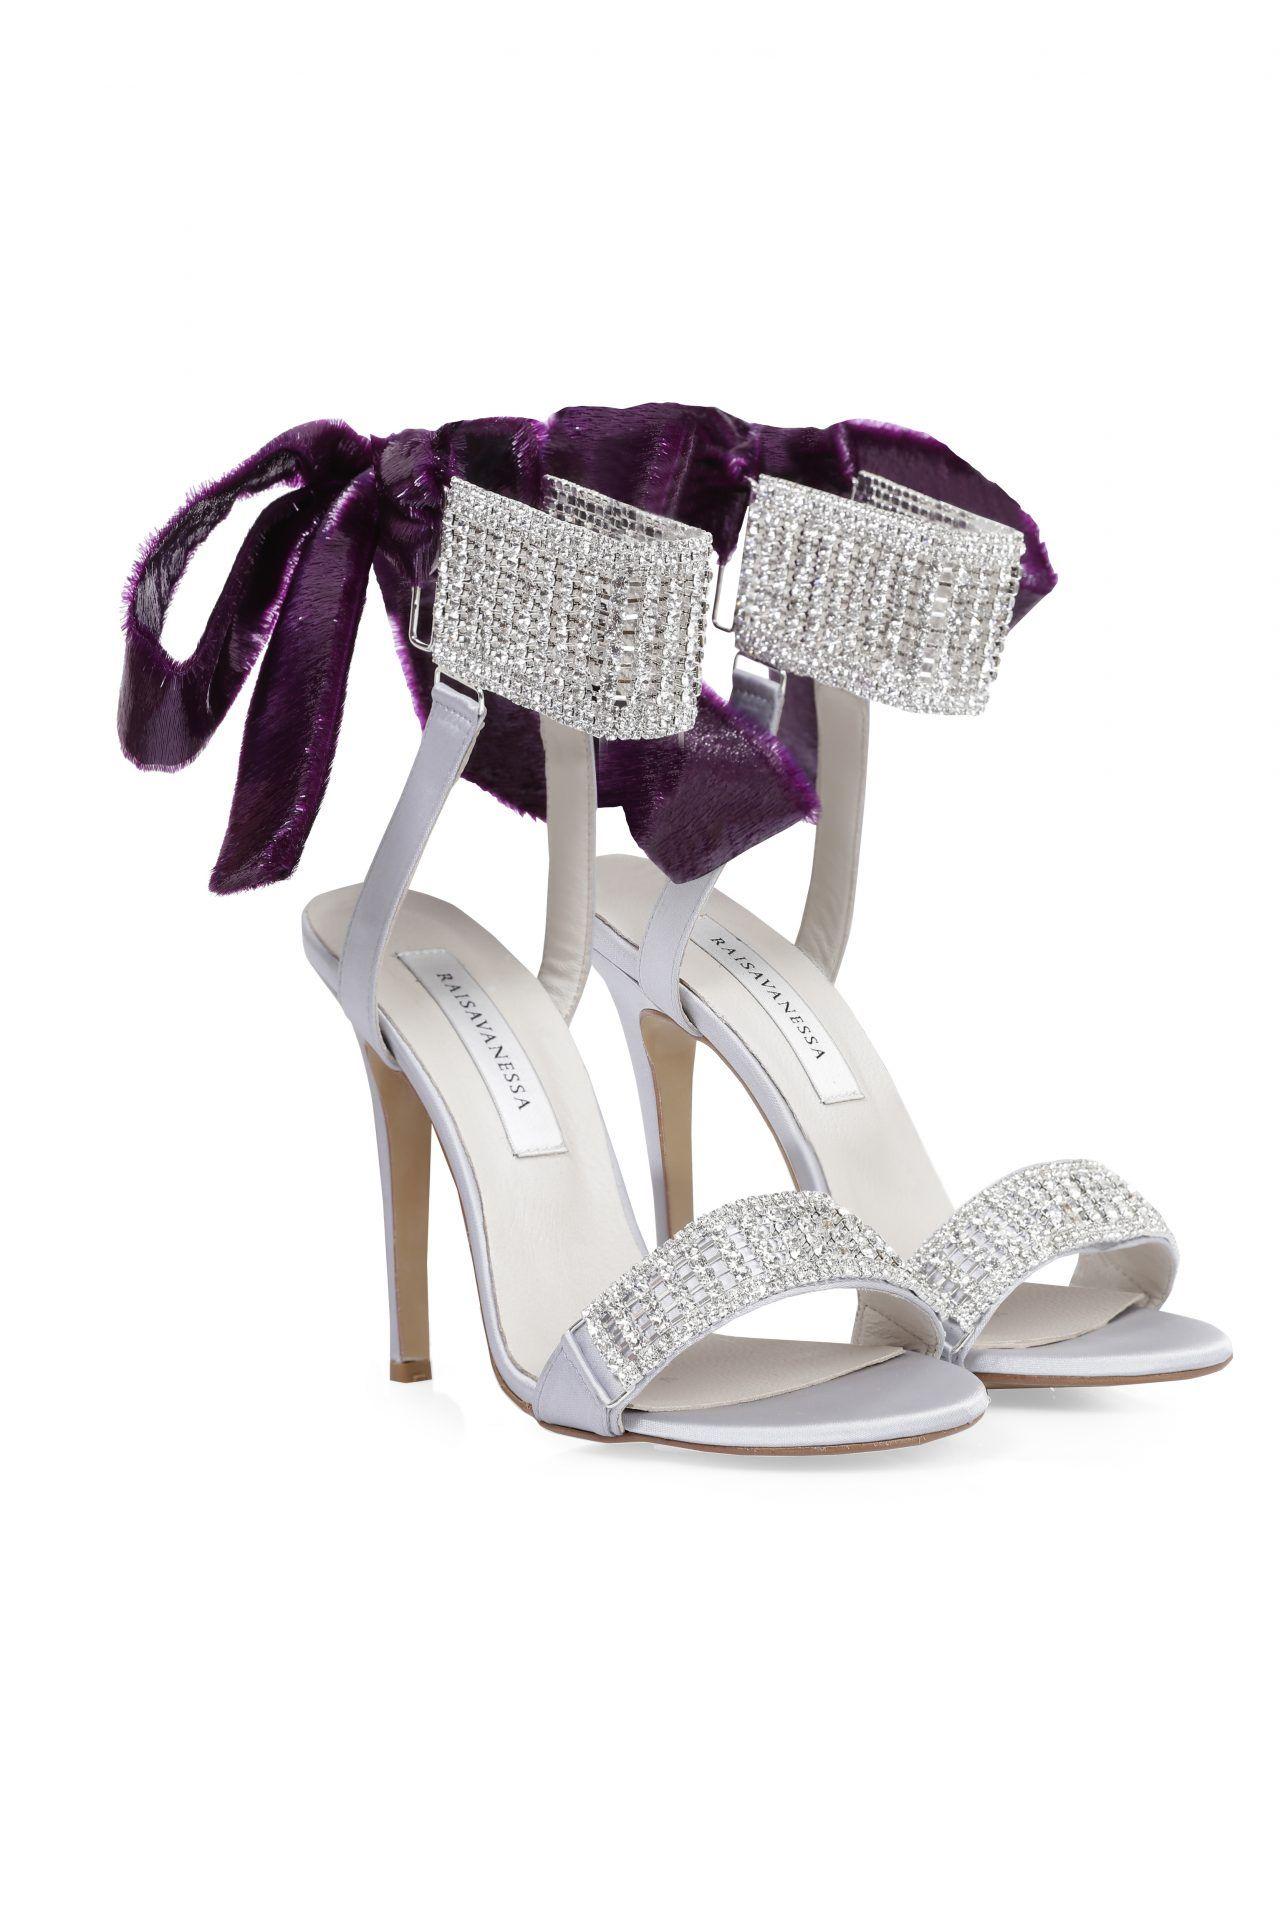 949ac1b4c4d high heel collection purple bow - Google Search